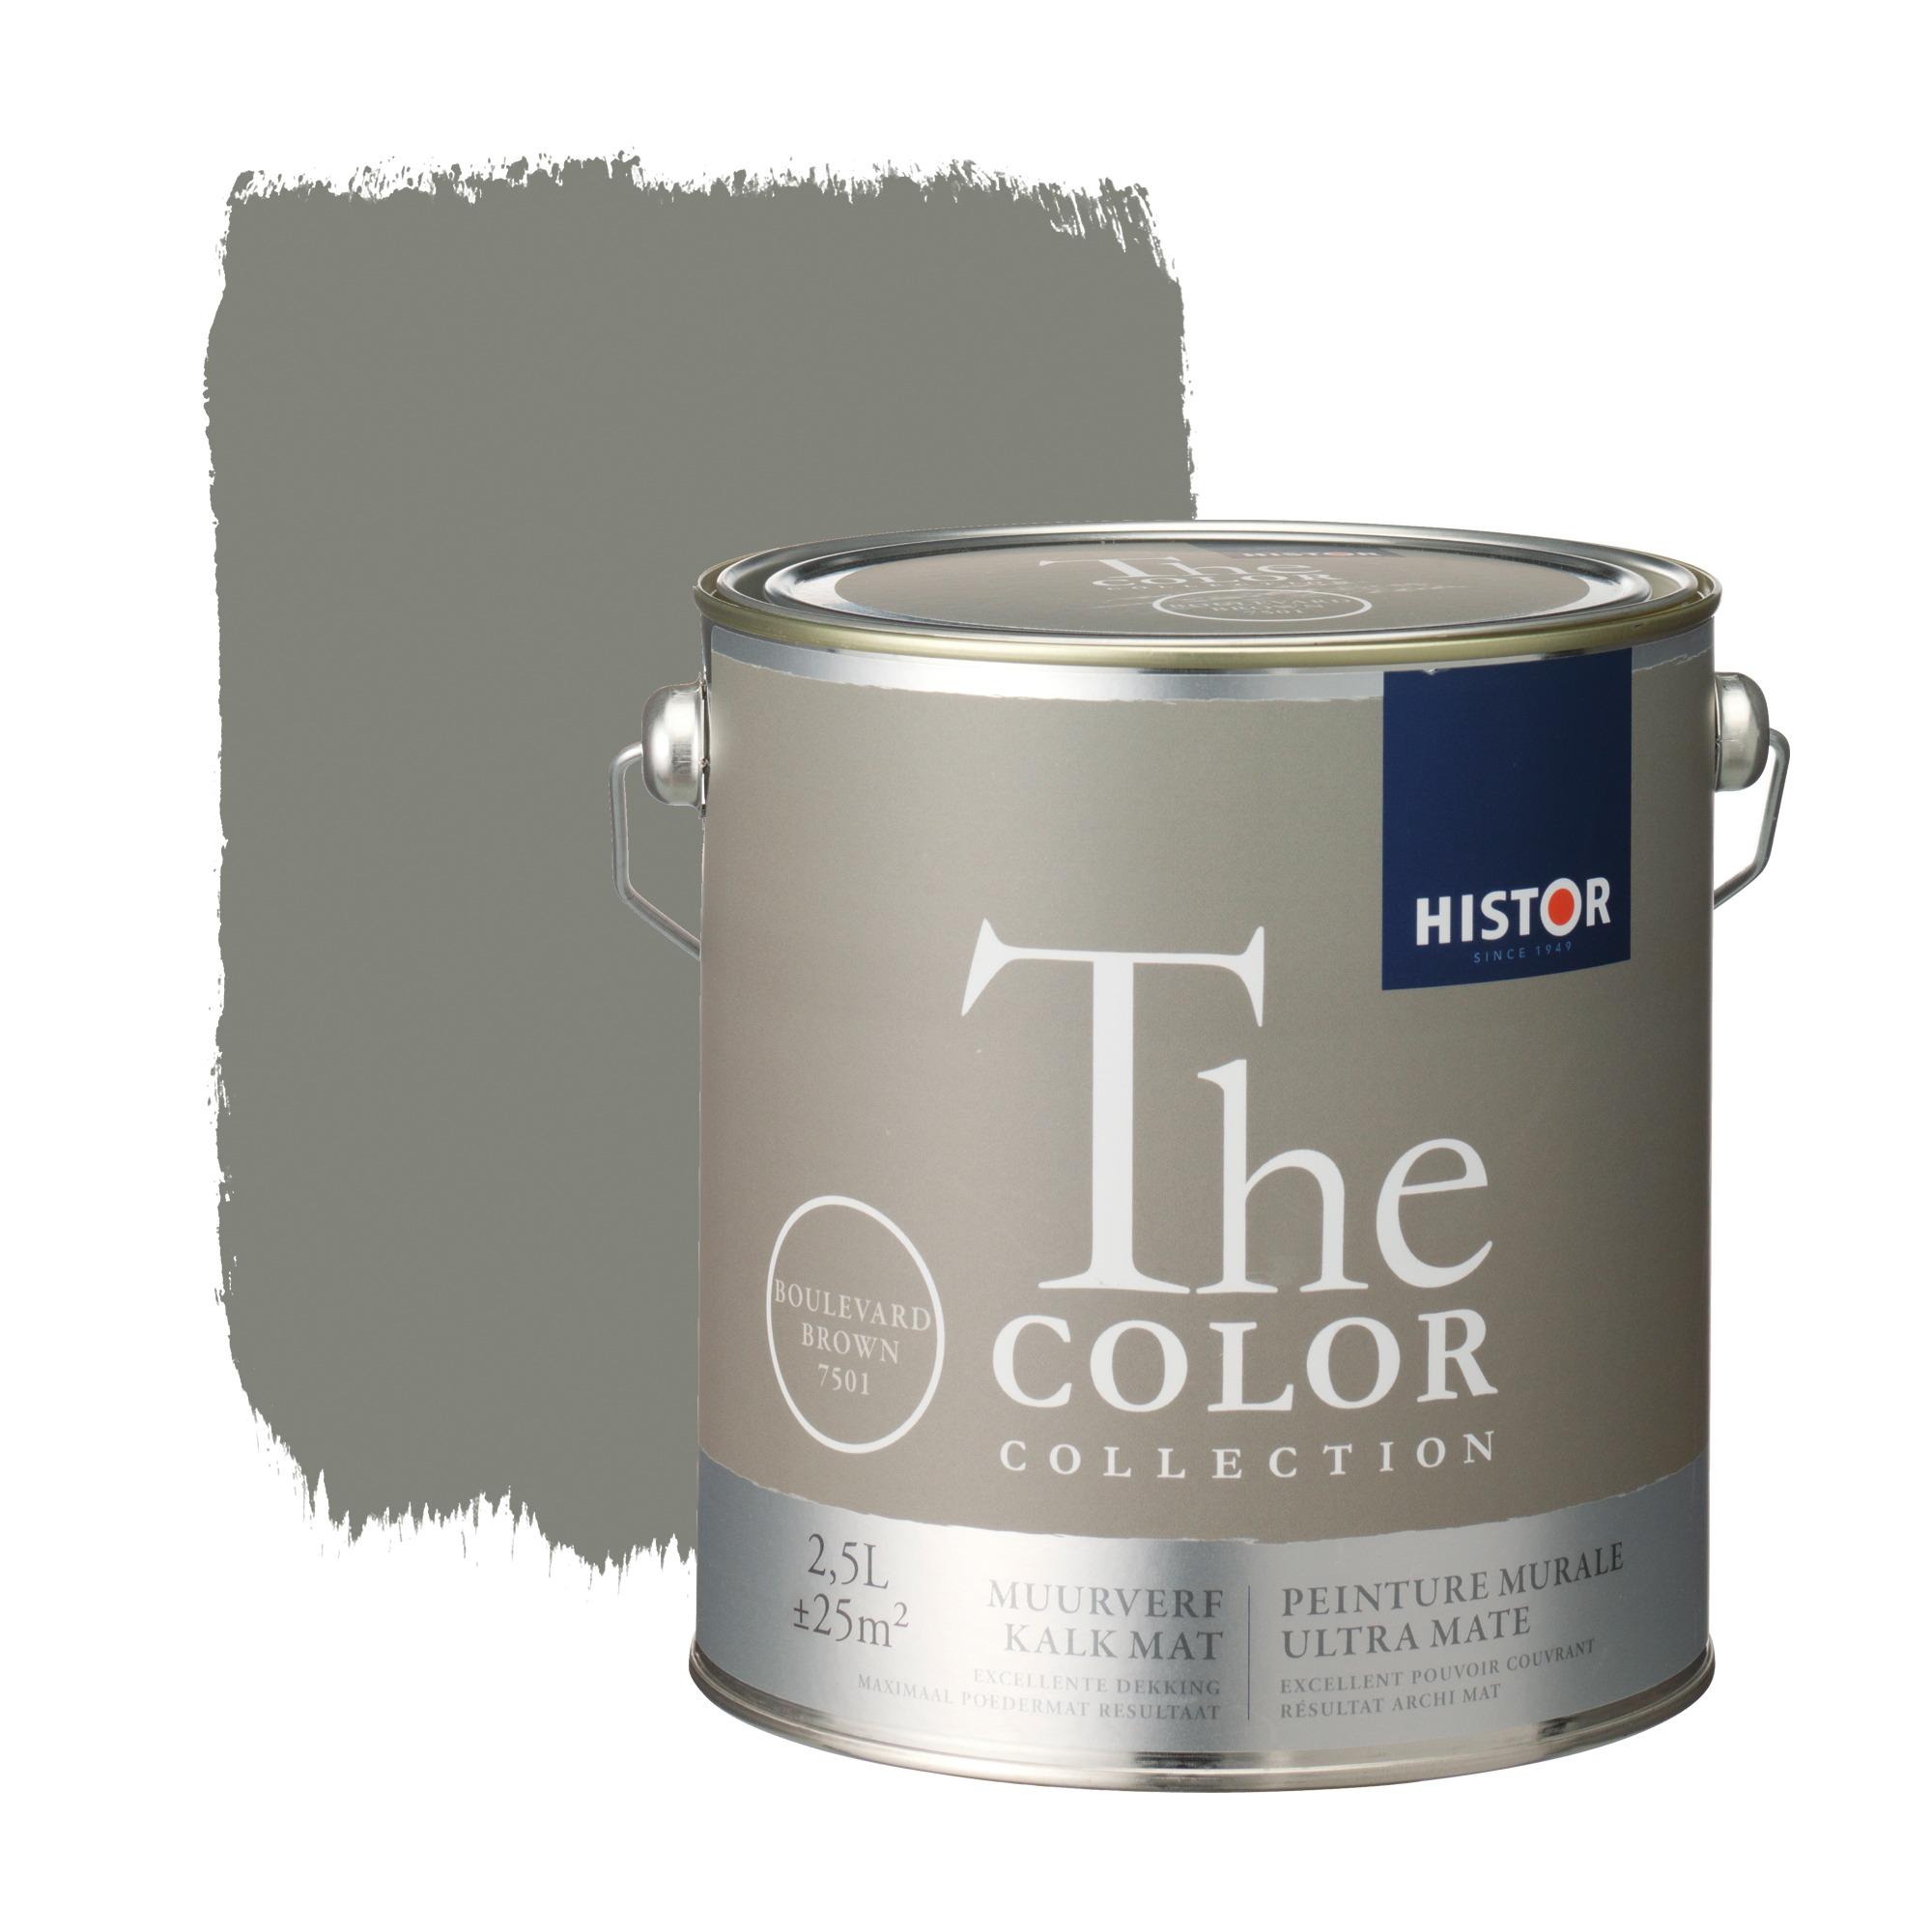 Histor the color collection muurverf kalkmat boulevard brown 7501 2,5 l